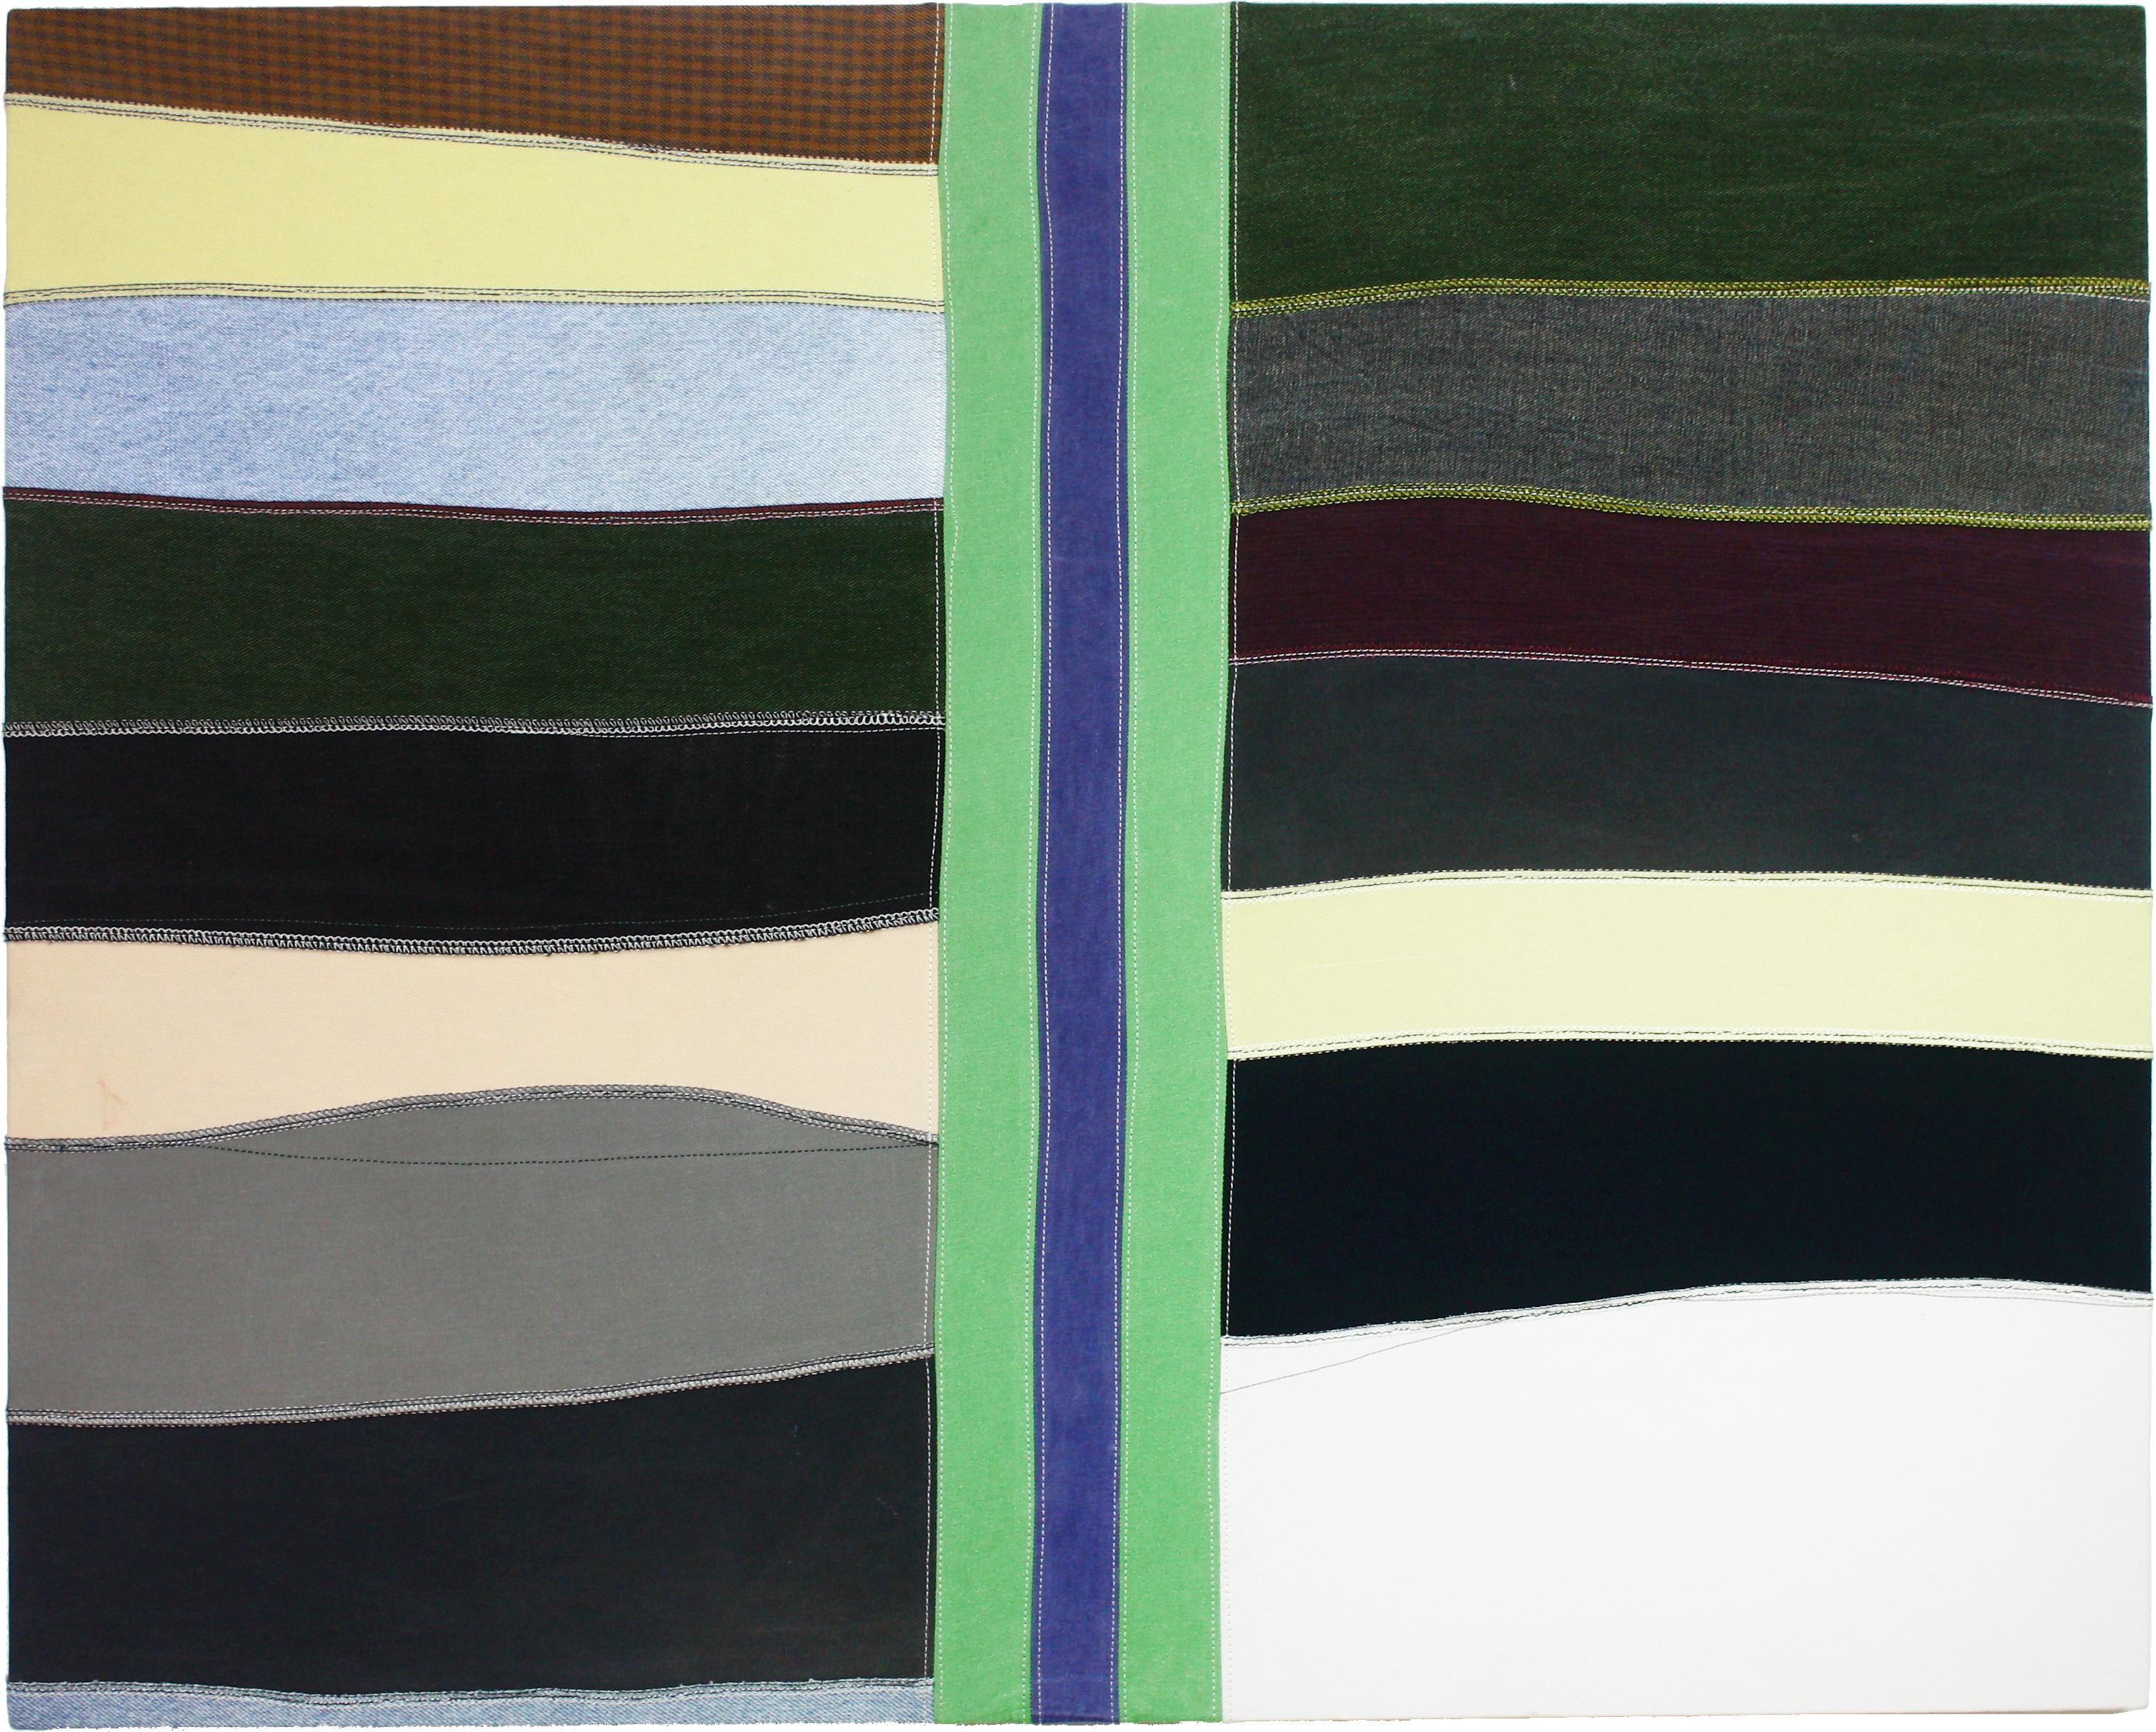 Canvas For BAR TWELVE(바 트웰브를 위한 캔버스), 2016, 90x72cm